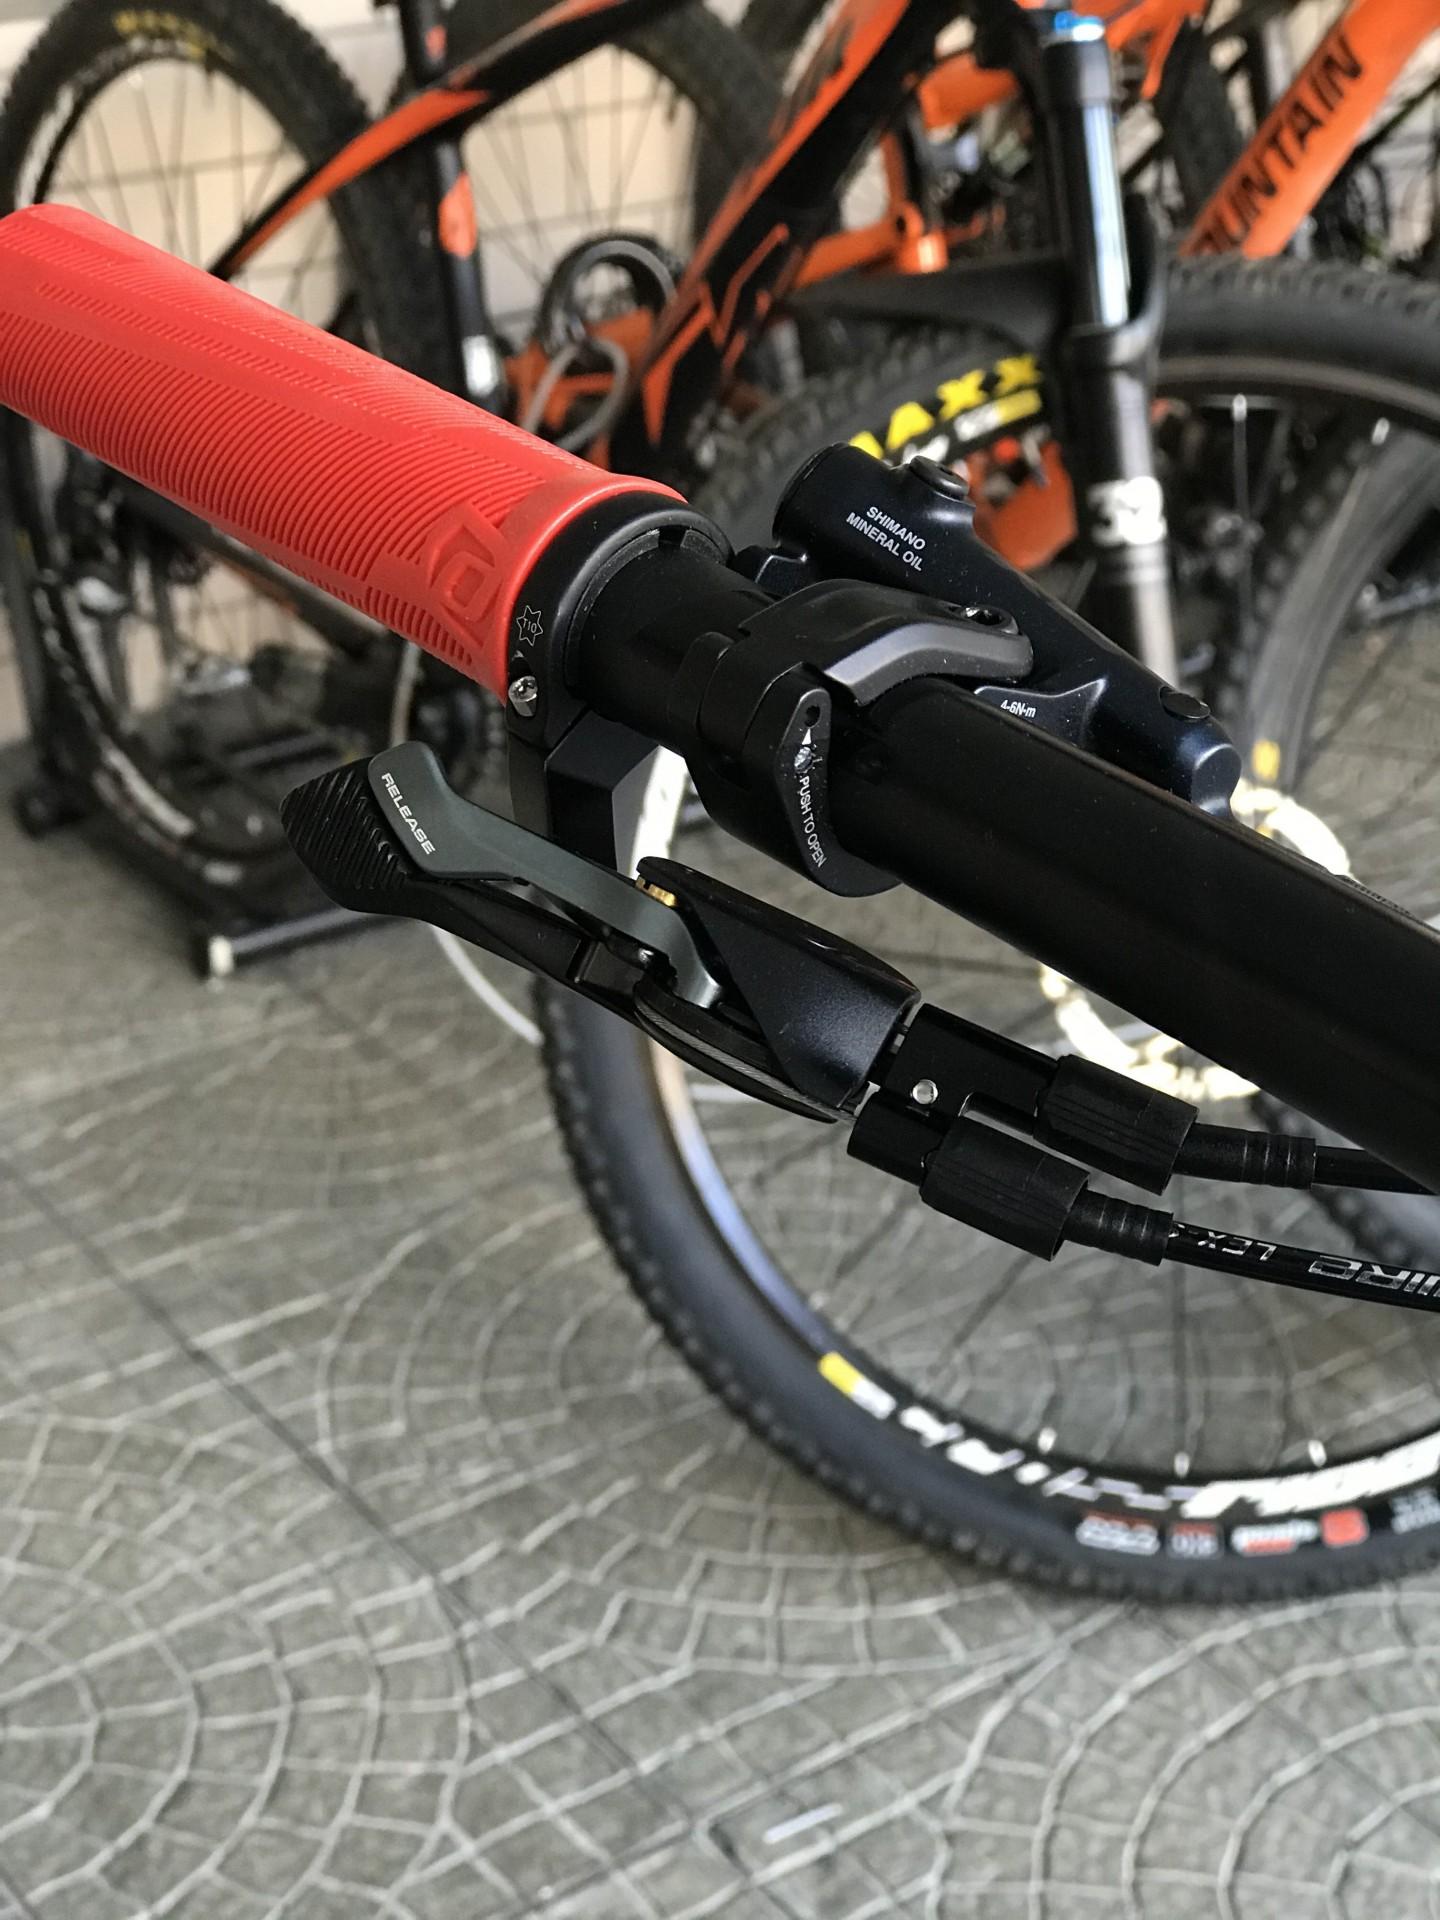 BICICLETA SCOTT SPARK RC 900 TEAM RED